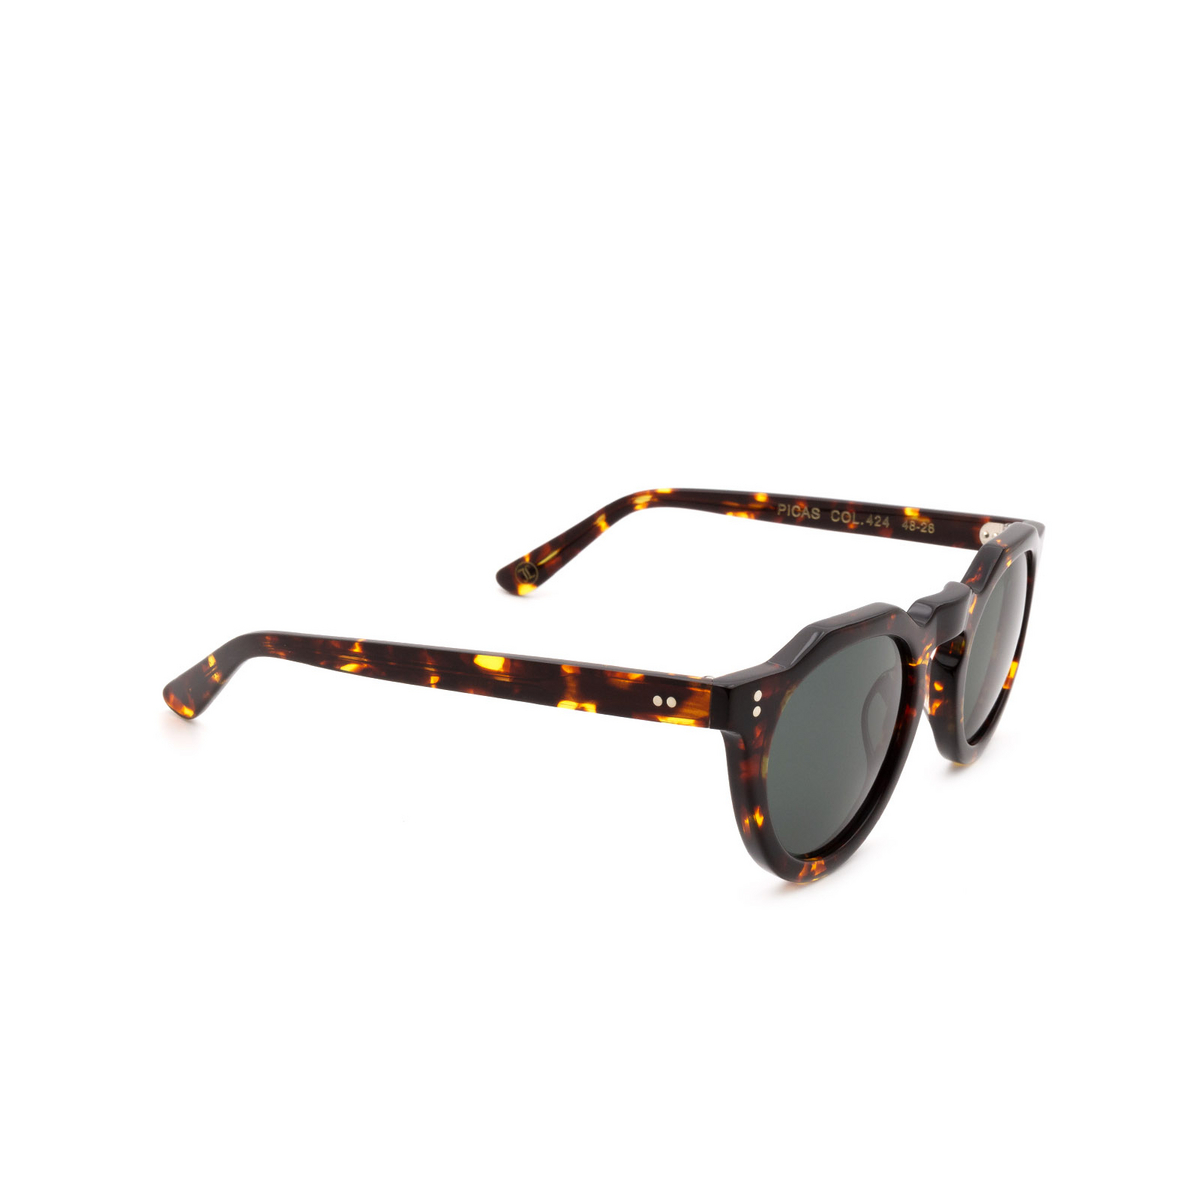 Lesca® Irregular Sunglasses: Picas color Écaille Foncé 424 - three-quarters view.